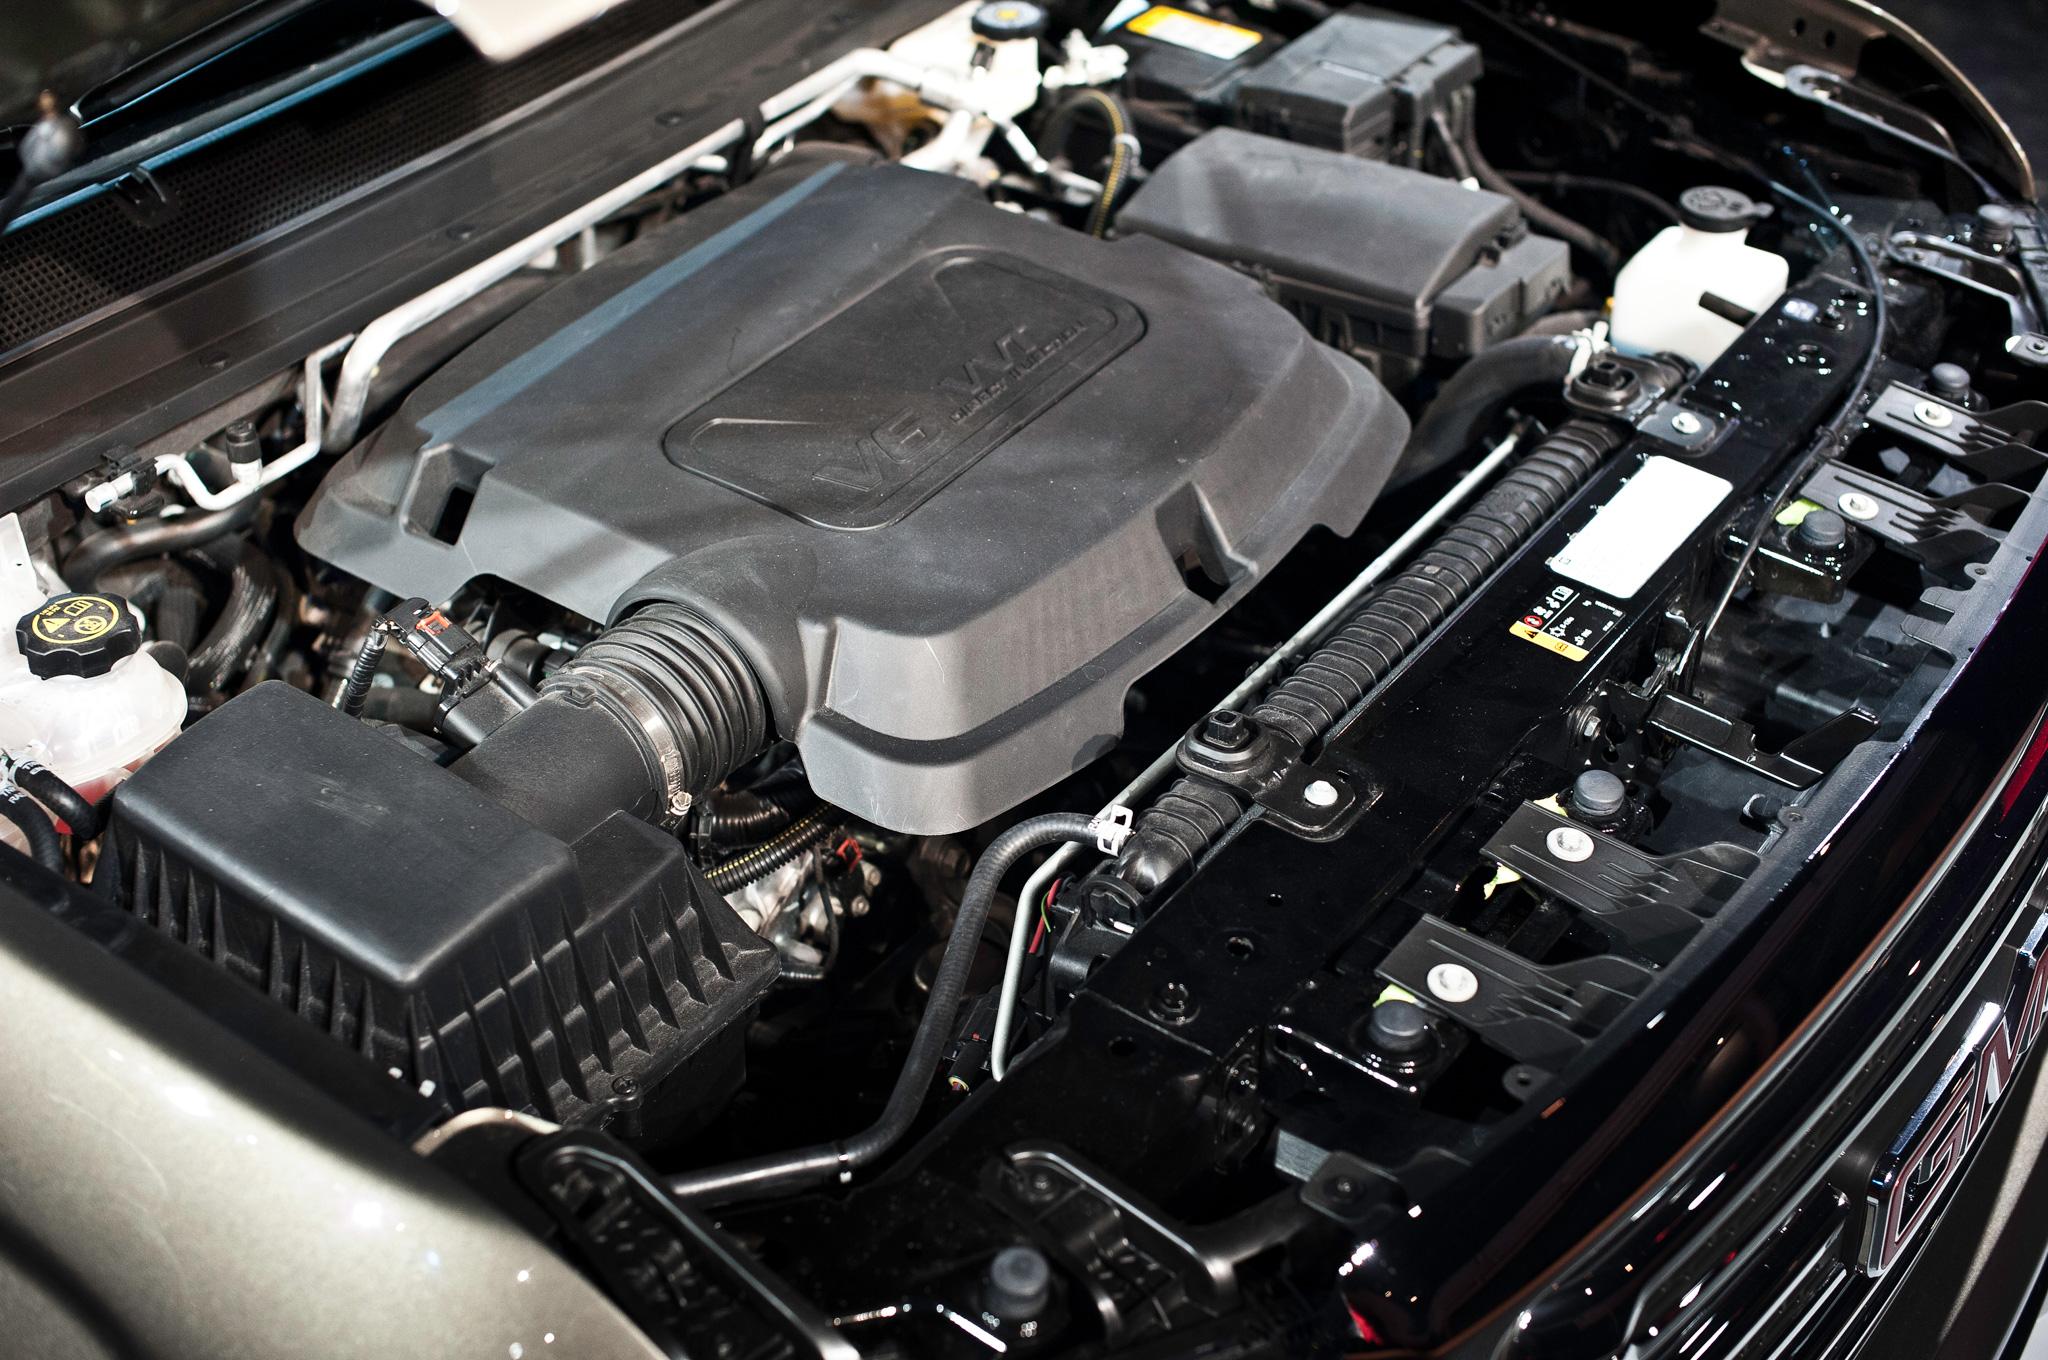 2015 GMC Canyon Engine View